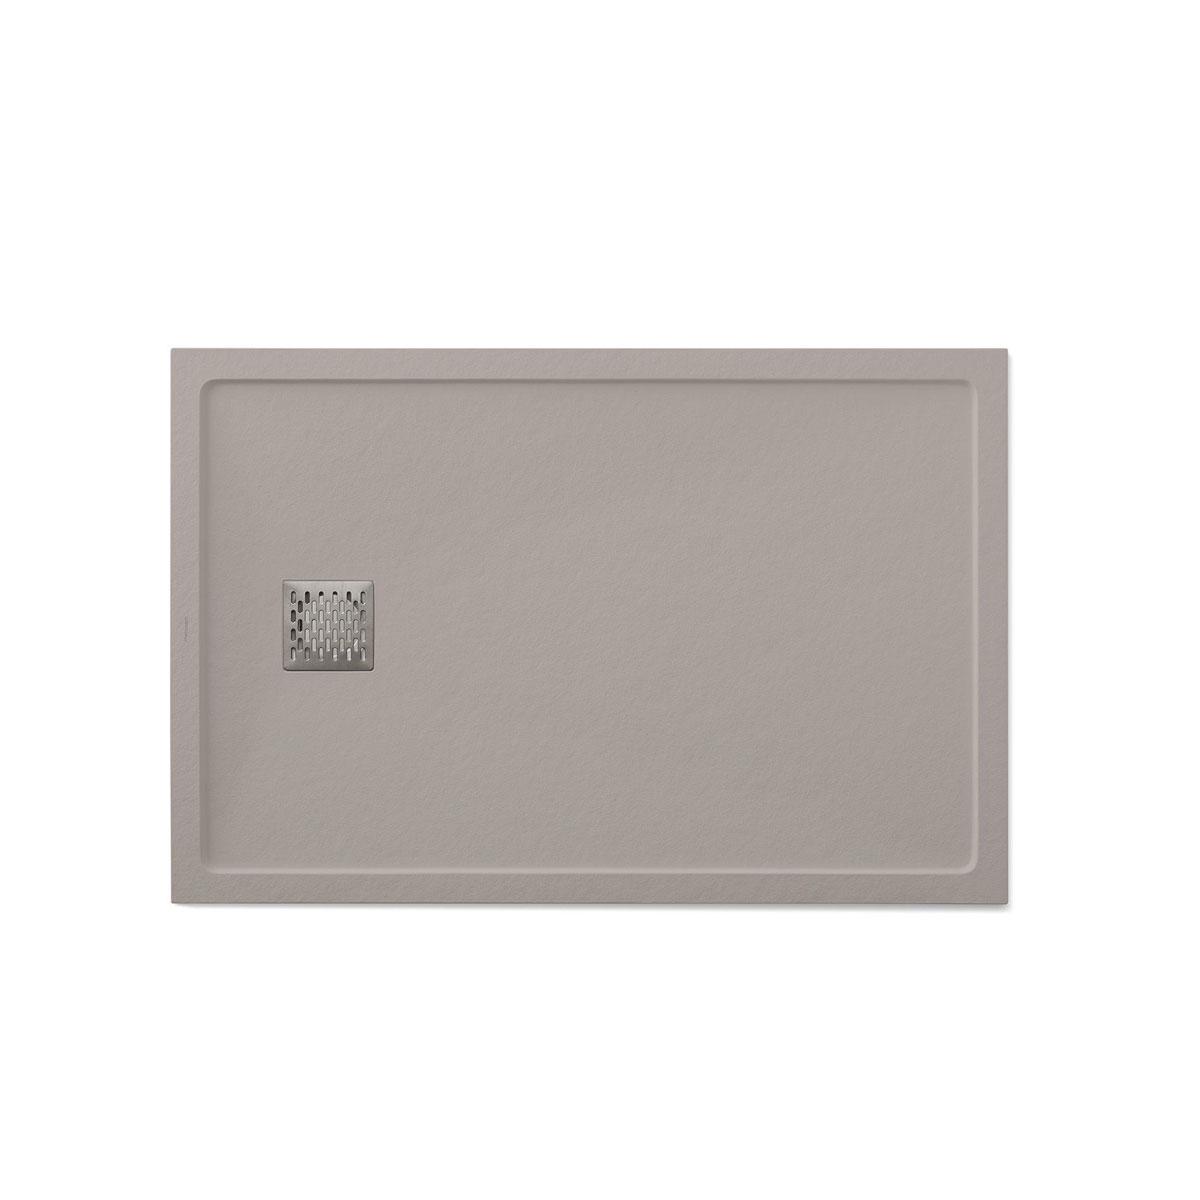 Plato de ducha rectangular 120x80 Ares Stone Nox Fango